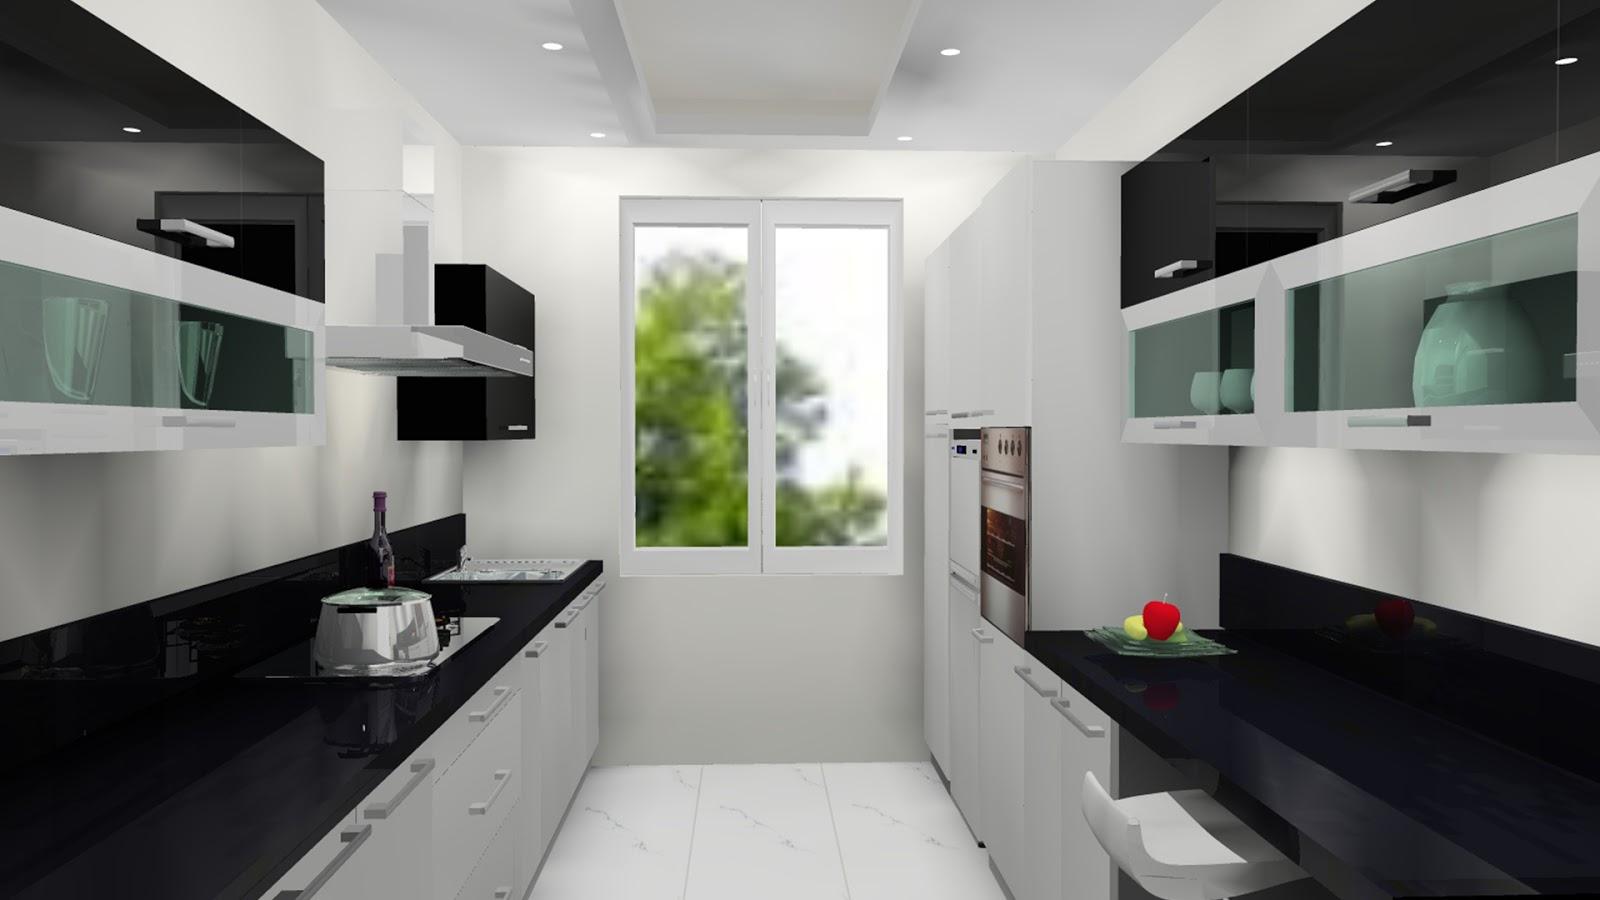 Wurfel Kuche: Traditional kitchens Vs Modular kitchens in India